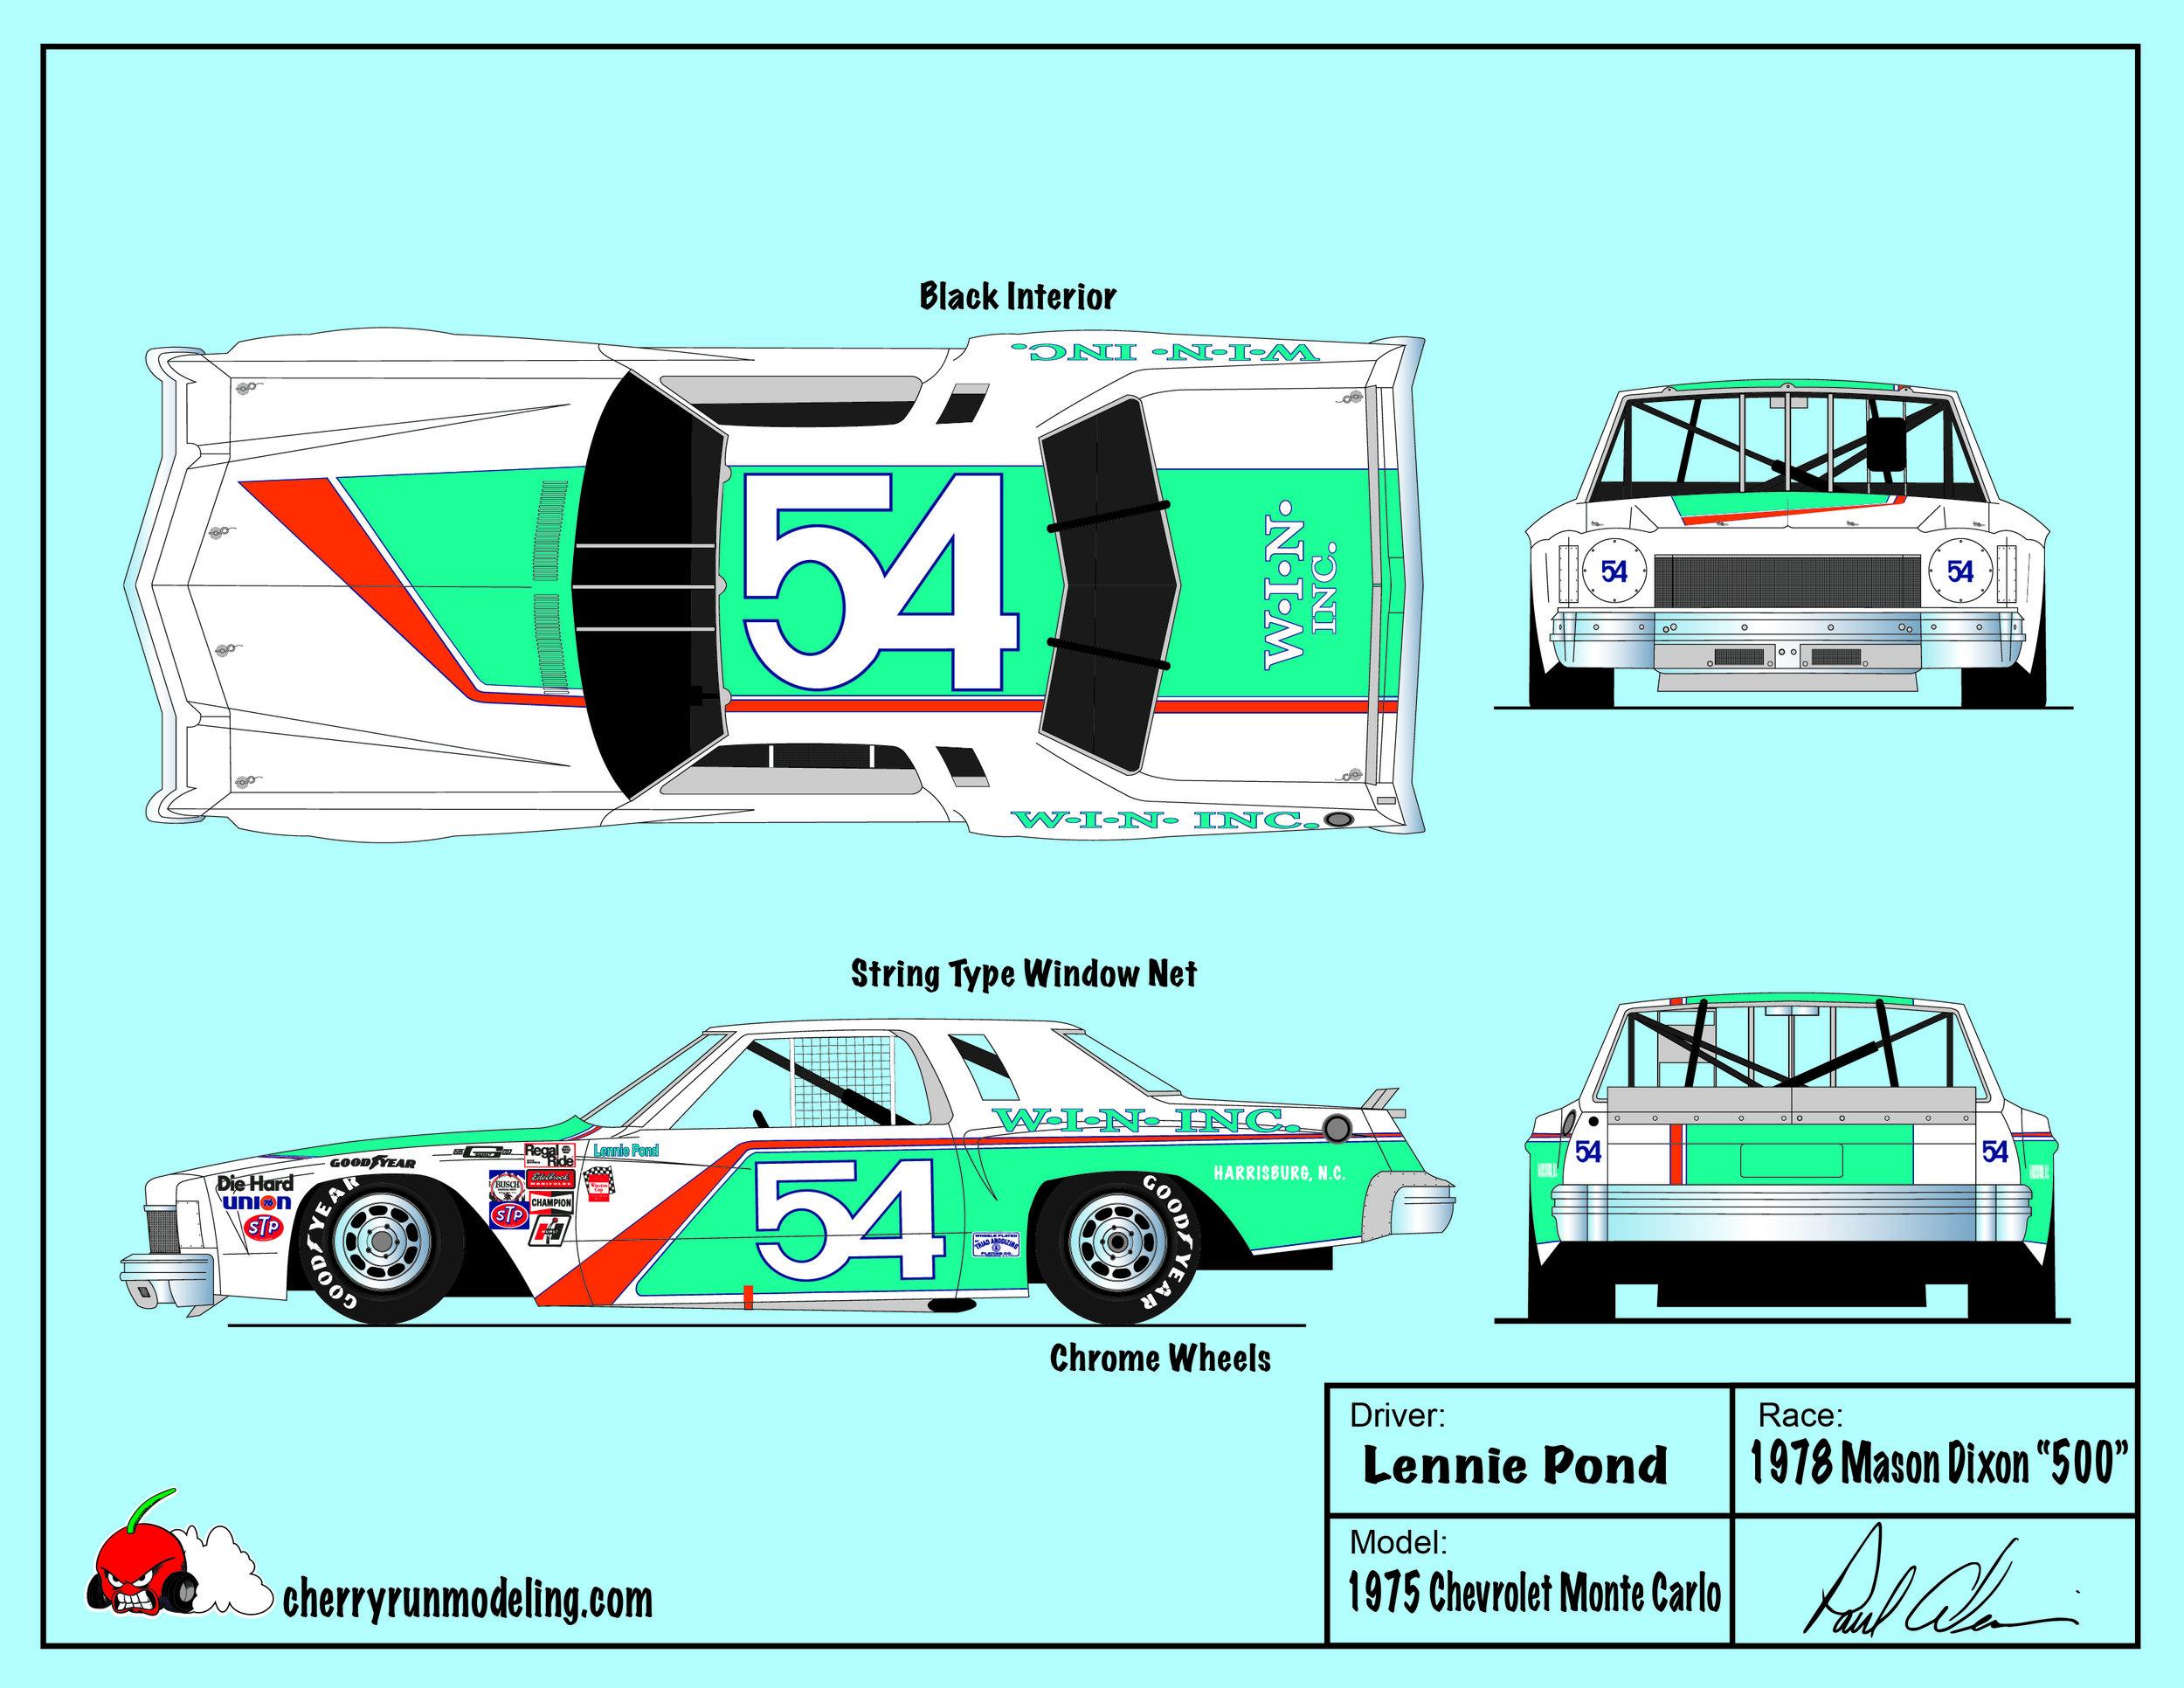 Lennie Pond 1978 Mason Dixon 500.jpg